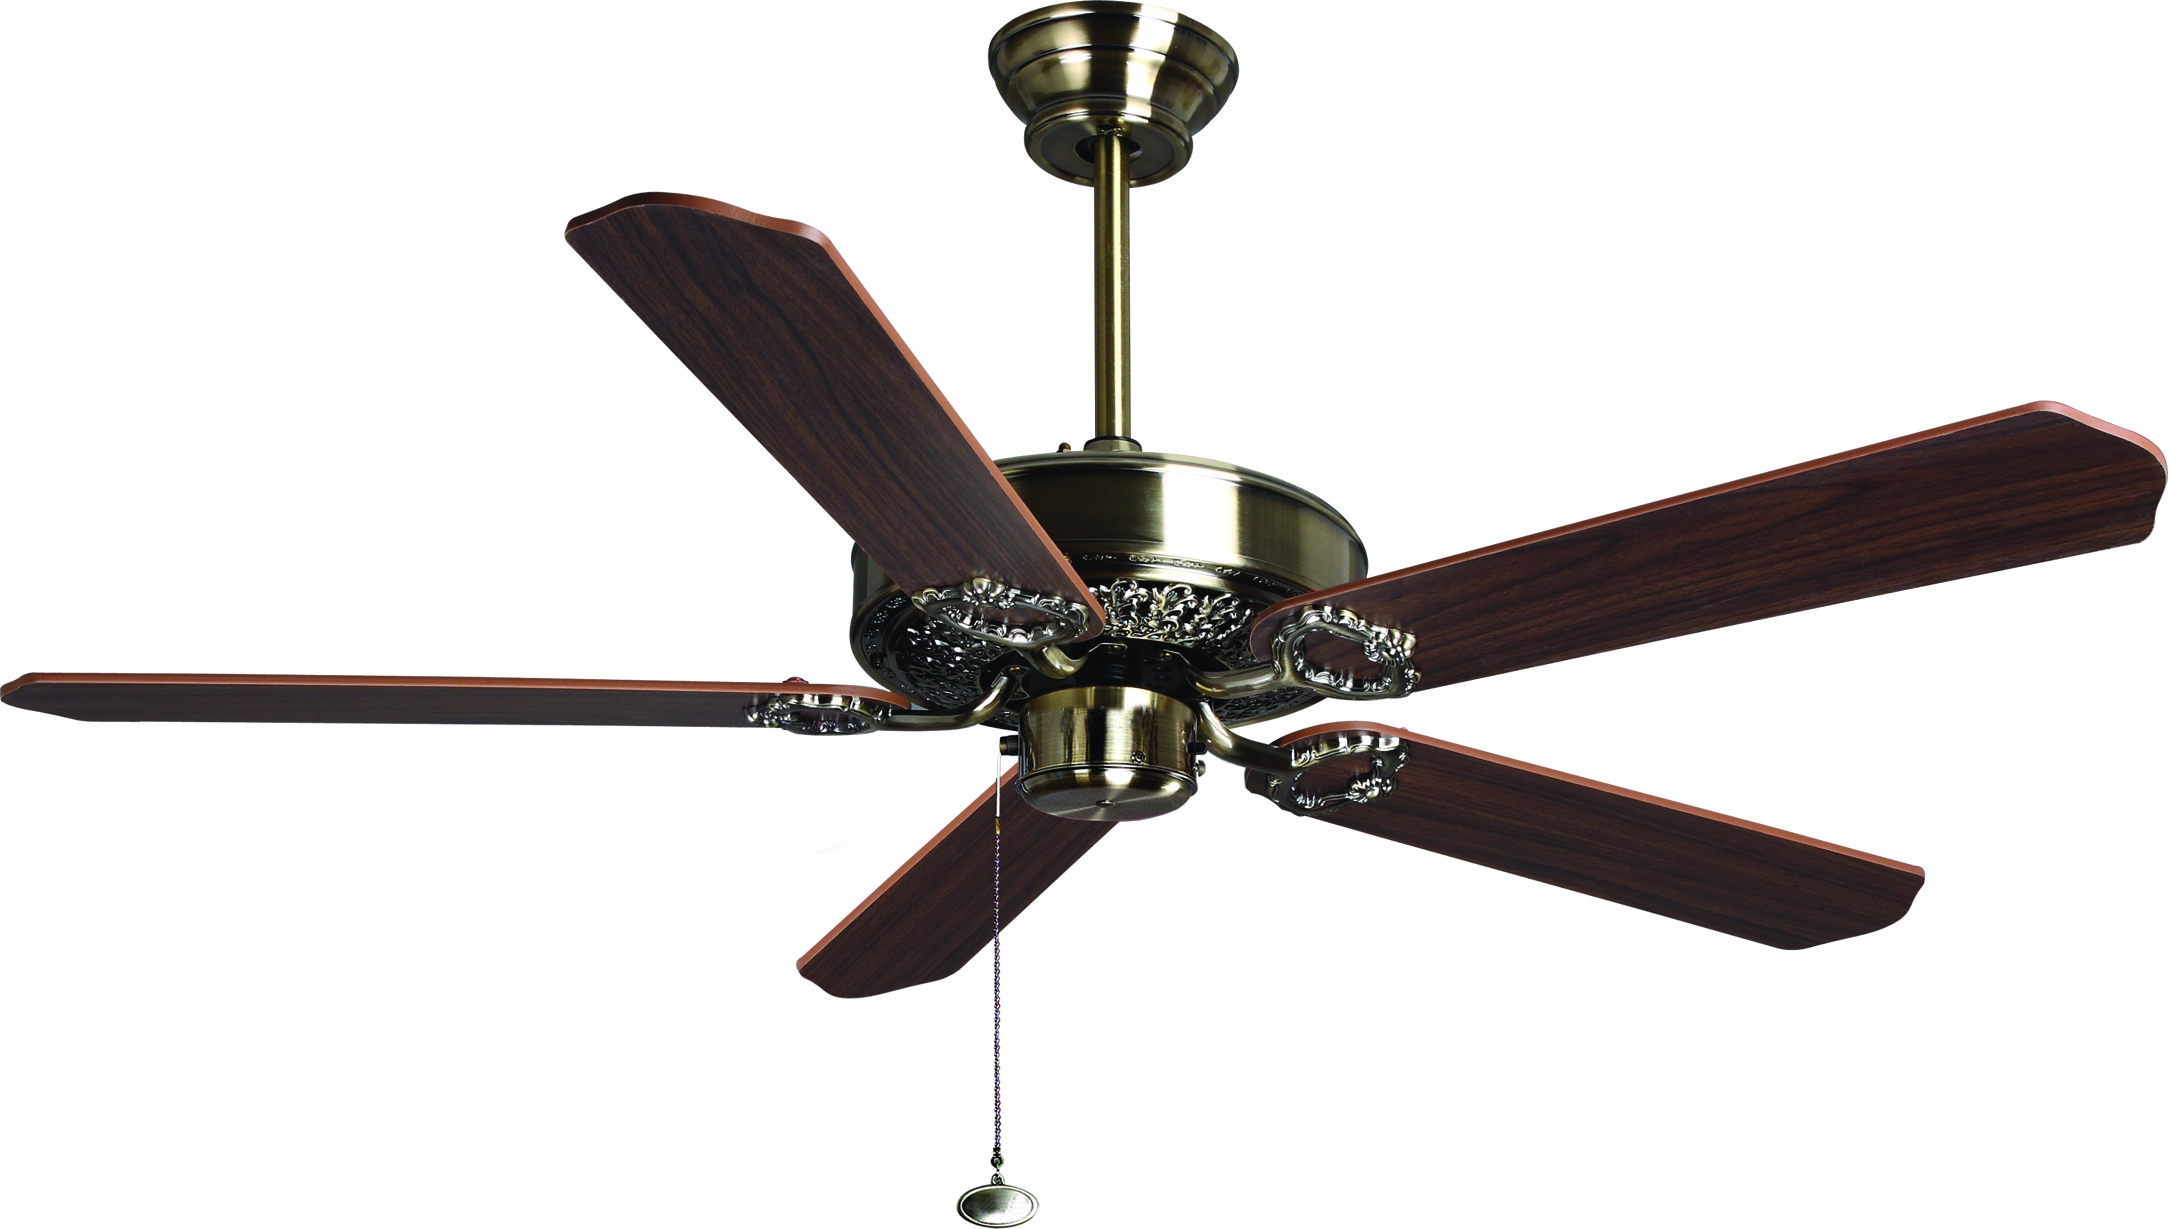 View Fanzart Florence 5 Blade Ceiling Fan(Brown) Home Appliances Price Online(Fanzart)